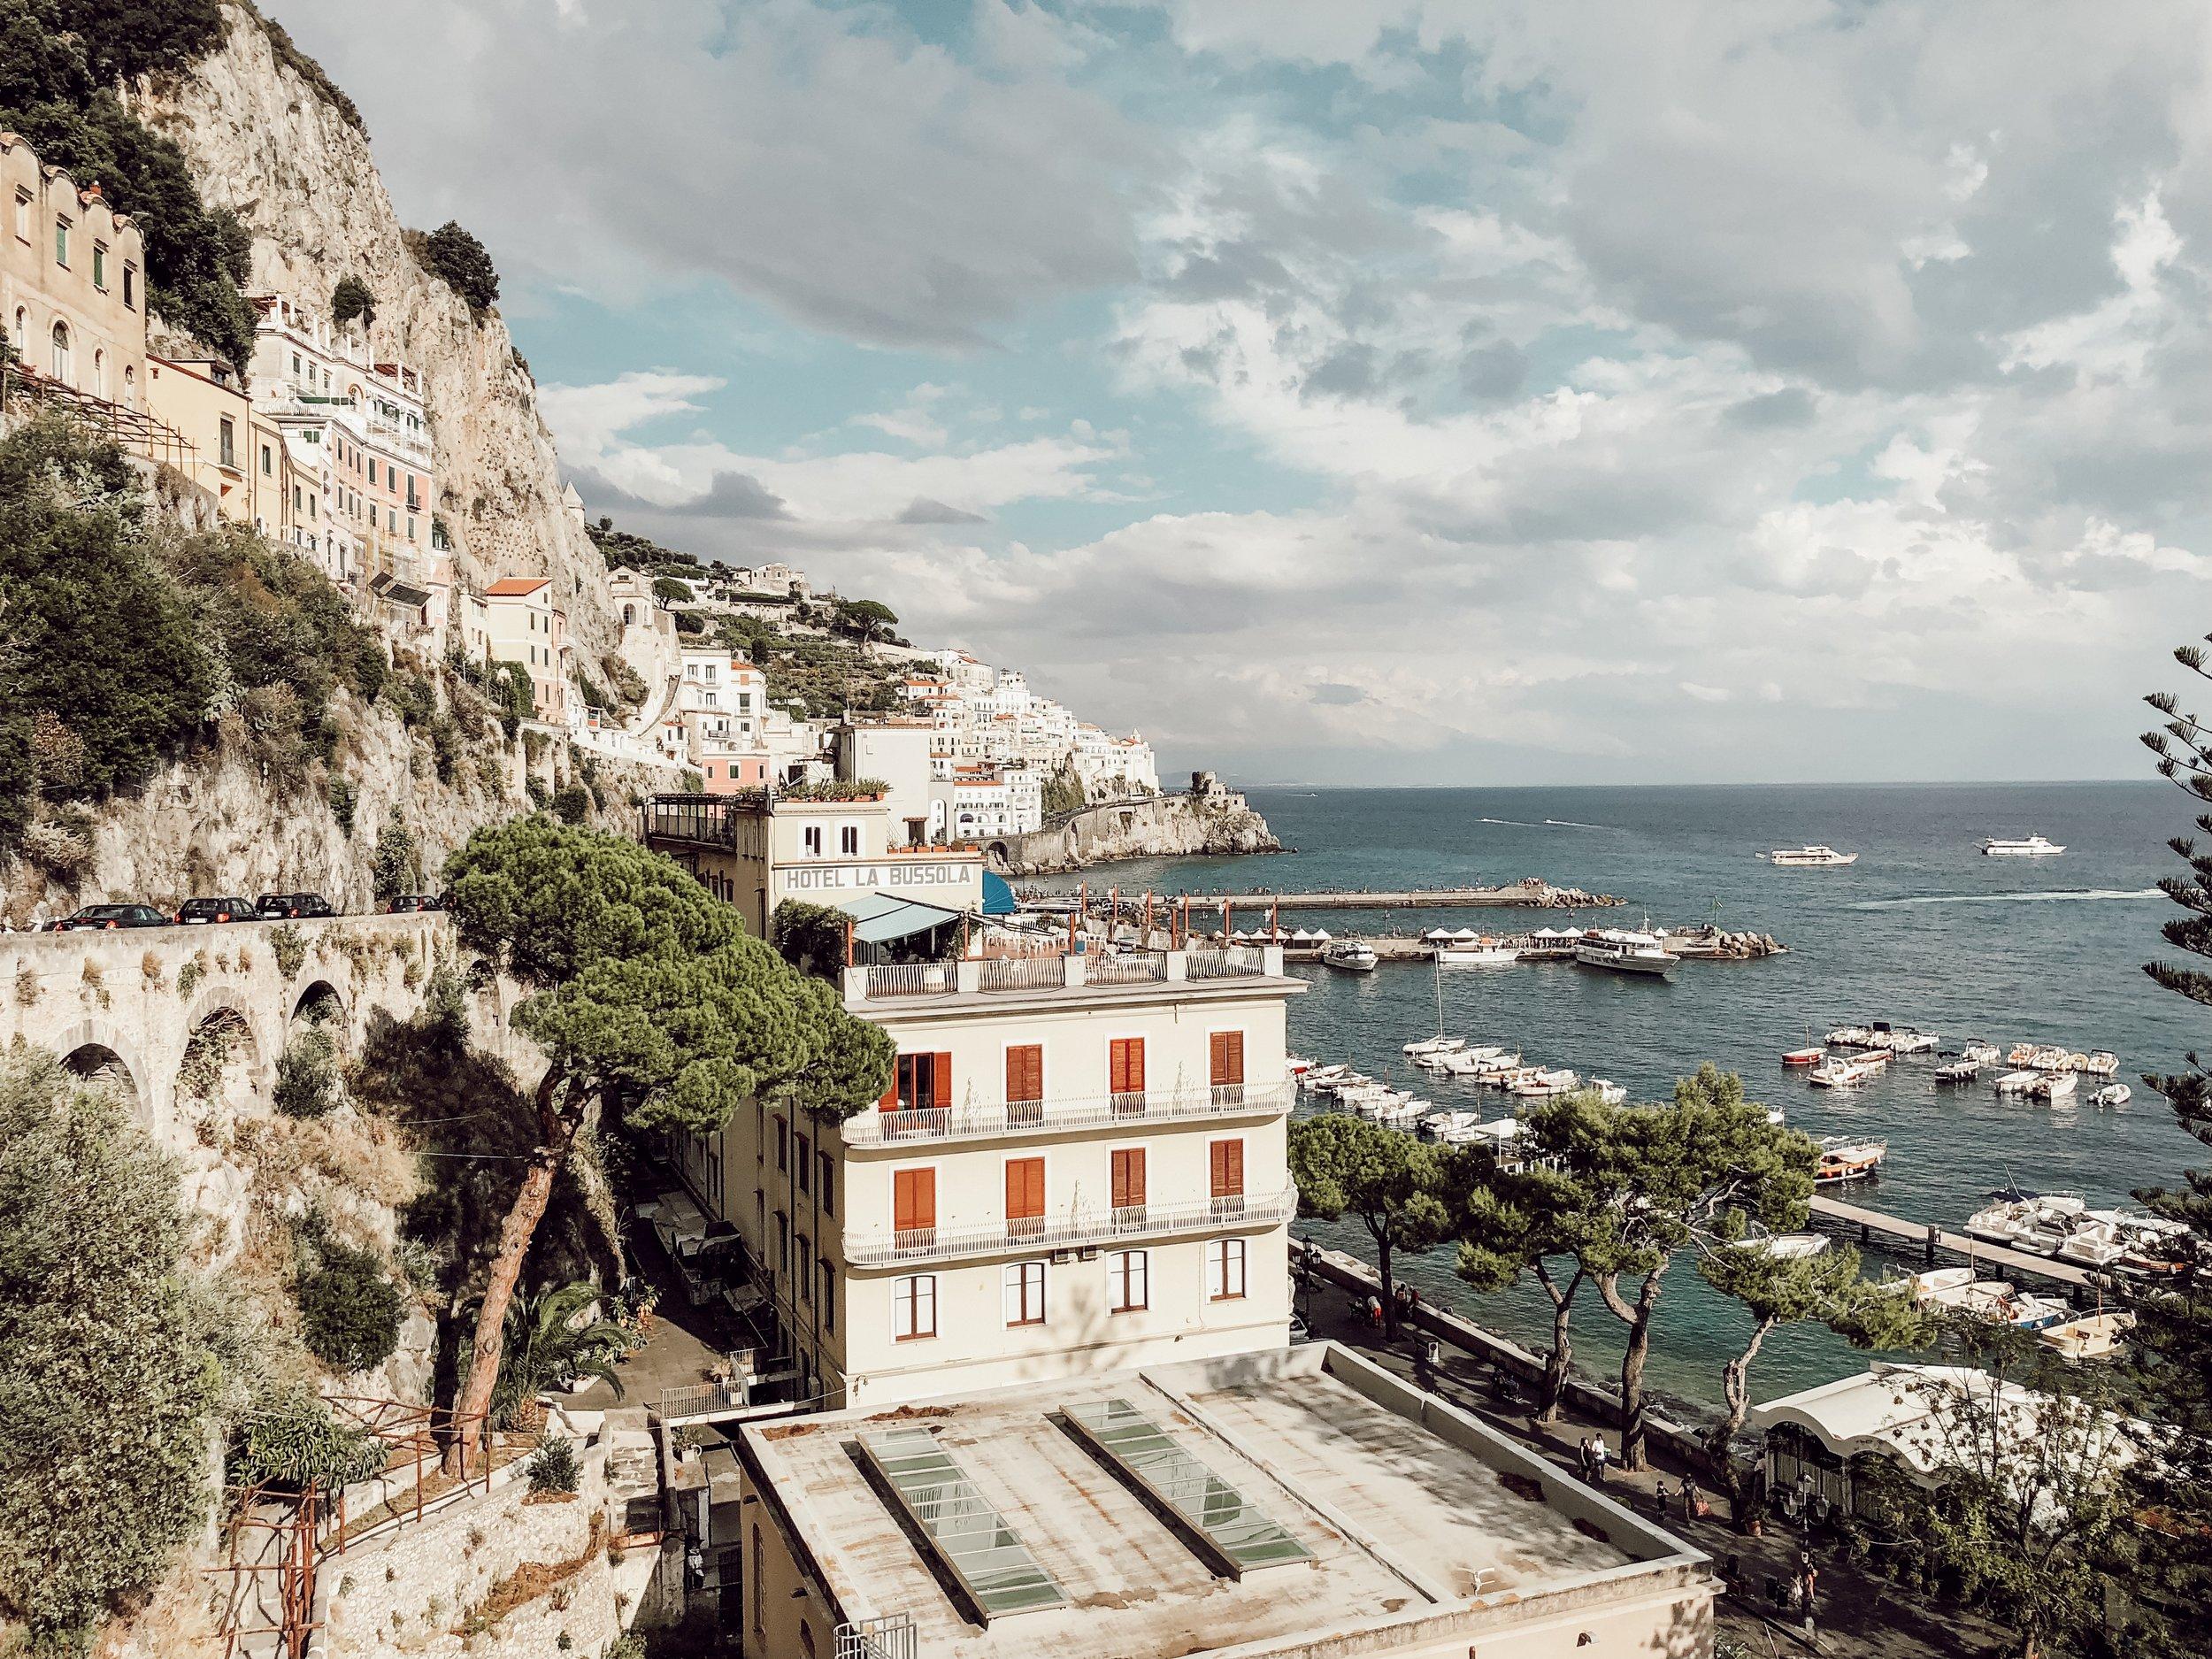 Airbnb Amalfi Coast Italy | Where to Stay Amalfi Coast | Italy Travel Guide Miranda Schroeder Blog